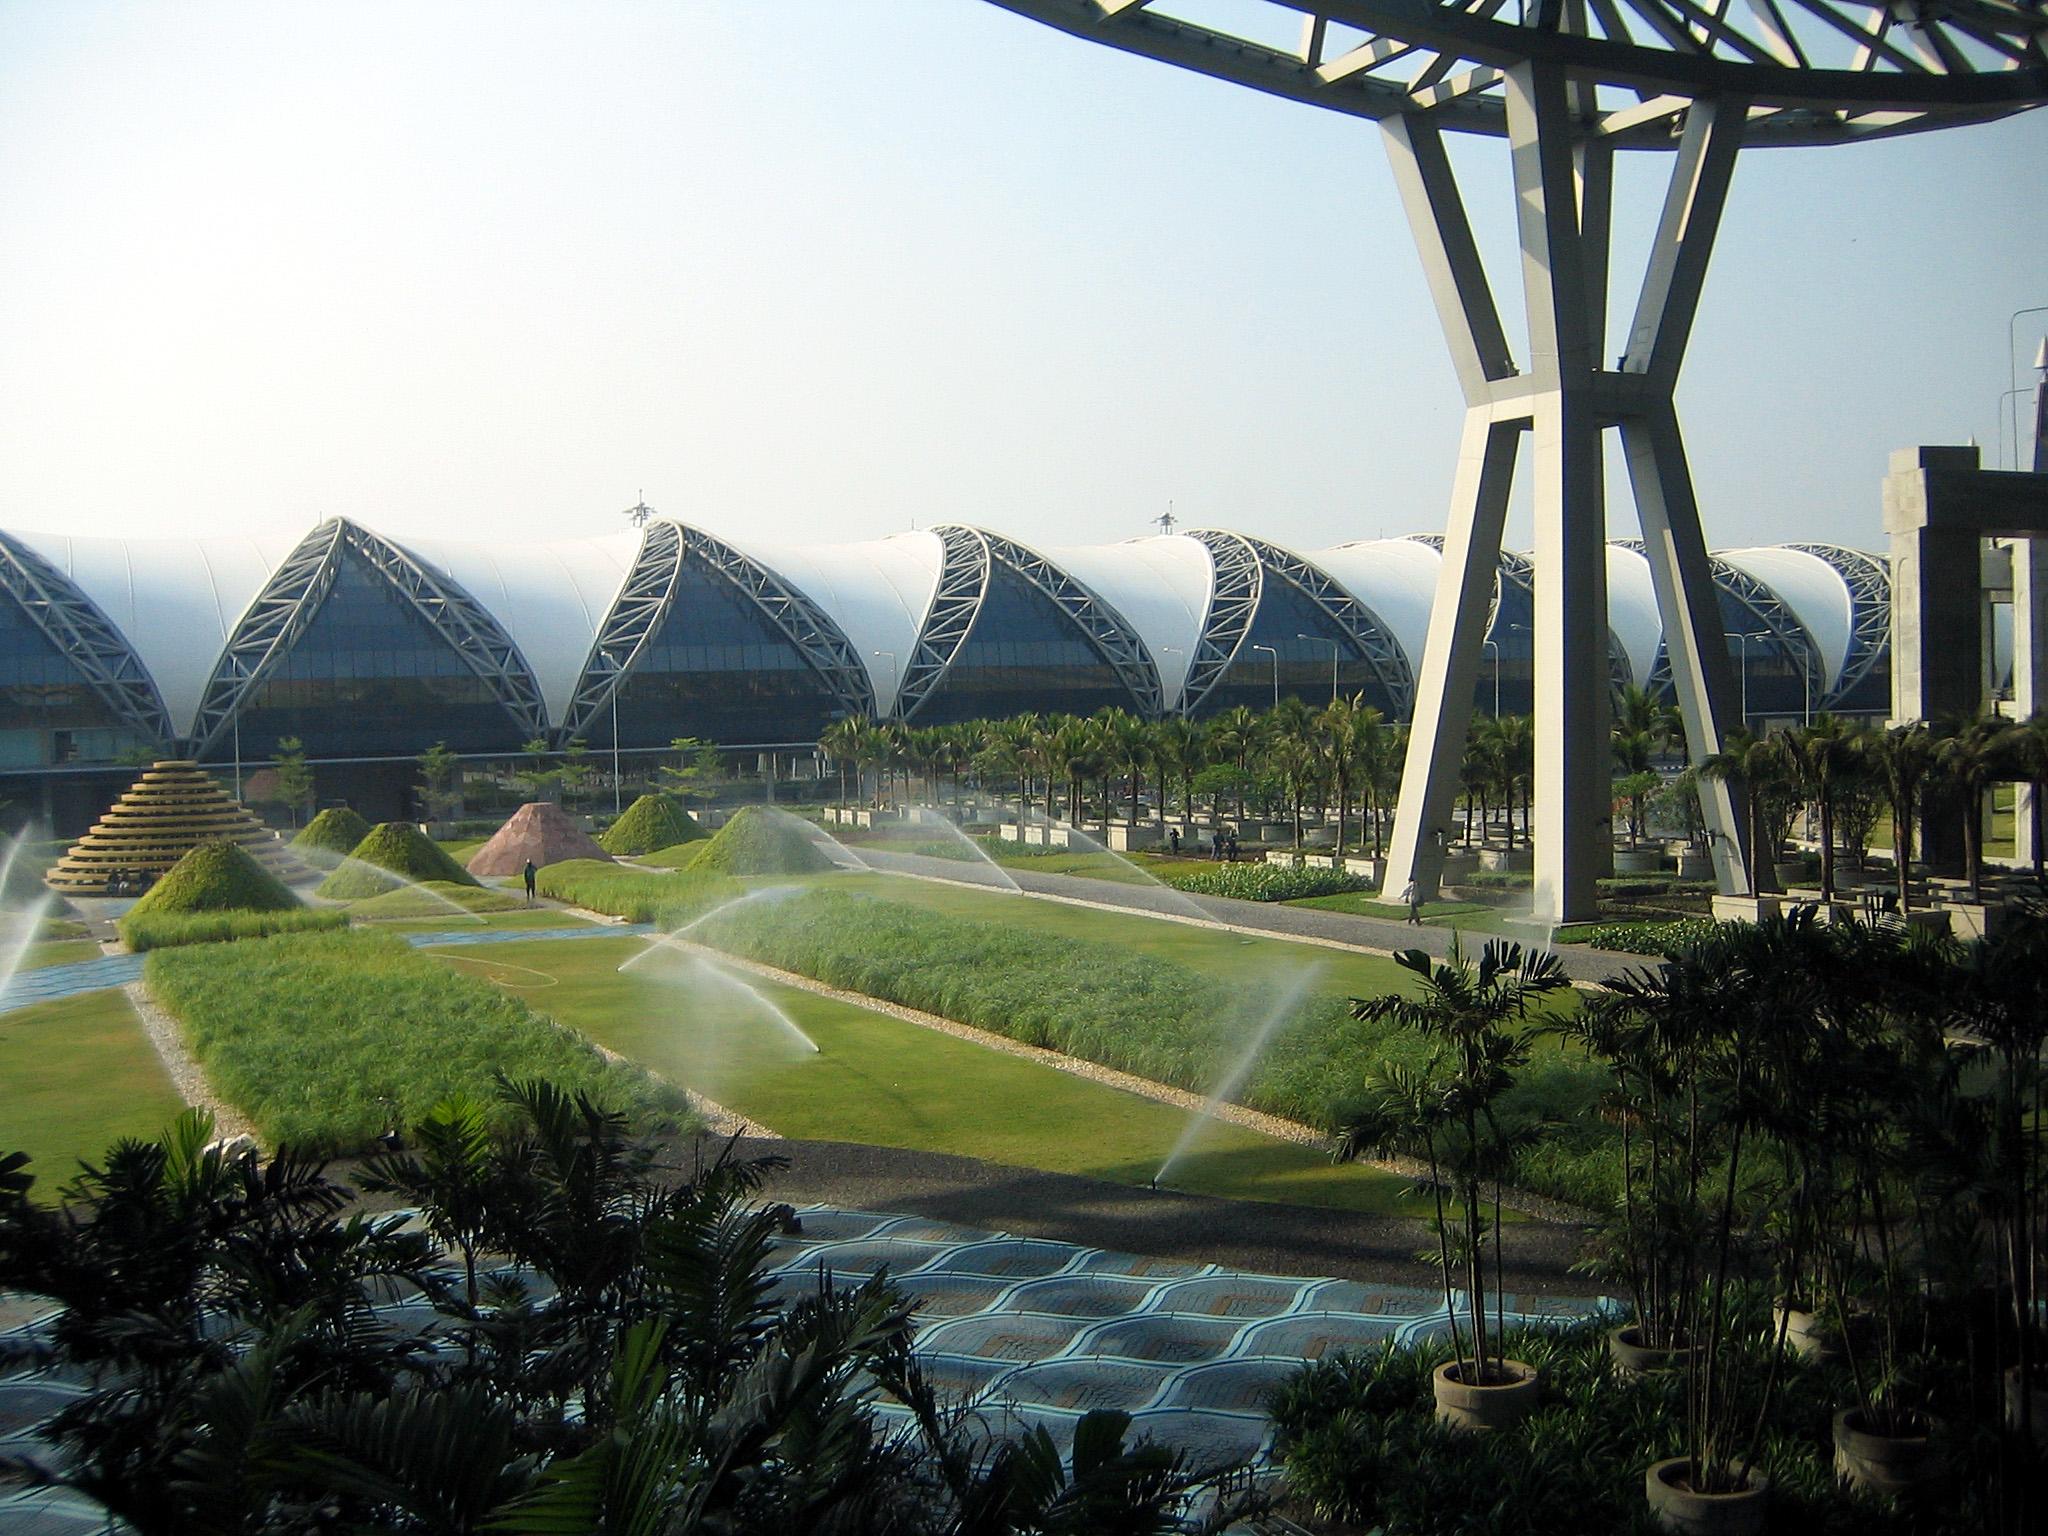 Gardens at Bangkok Suvarnabhumi International Airport